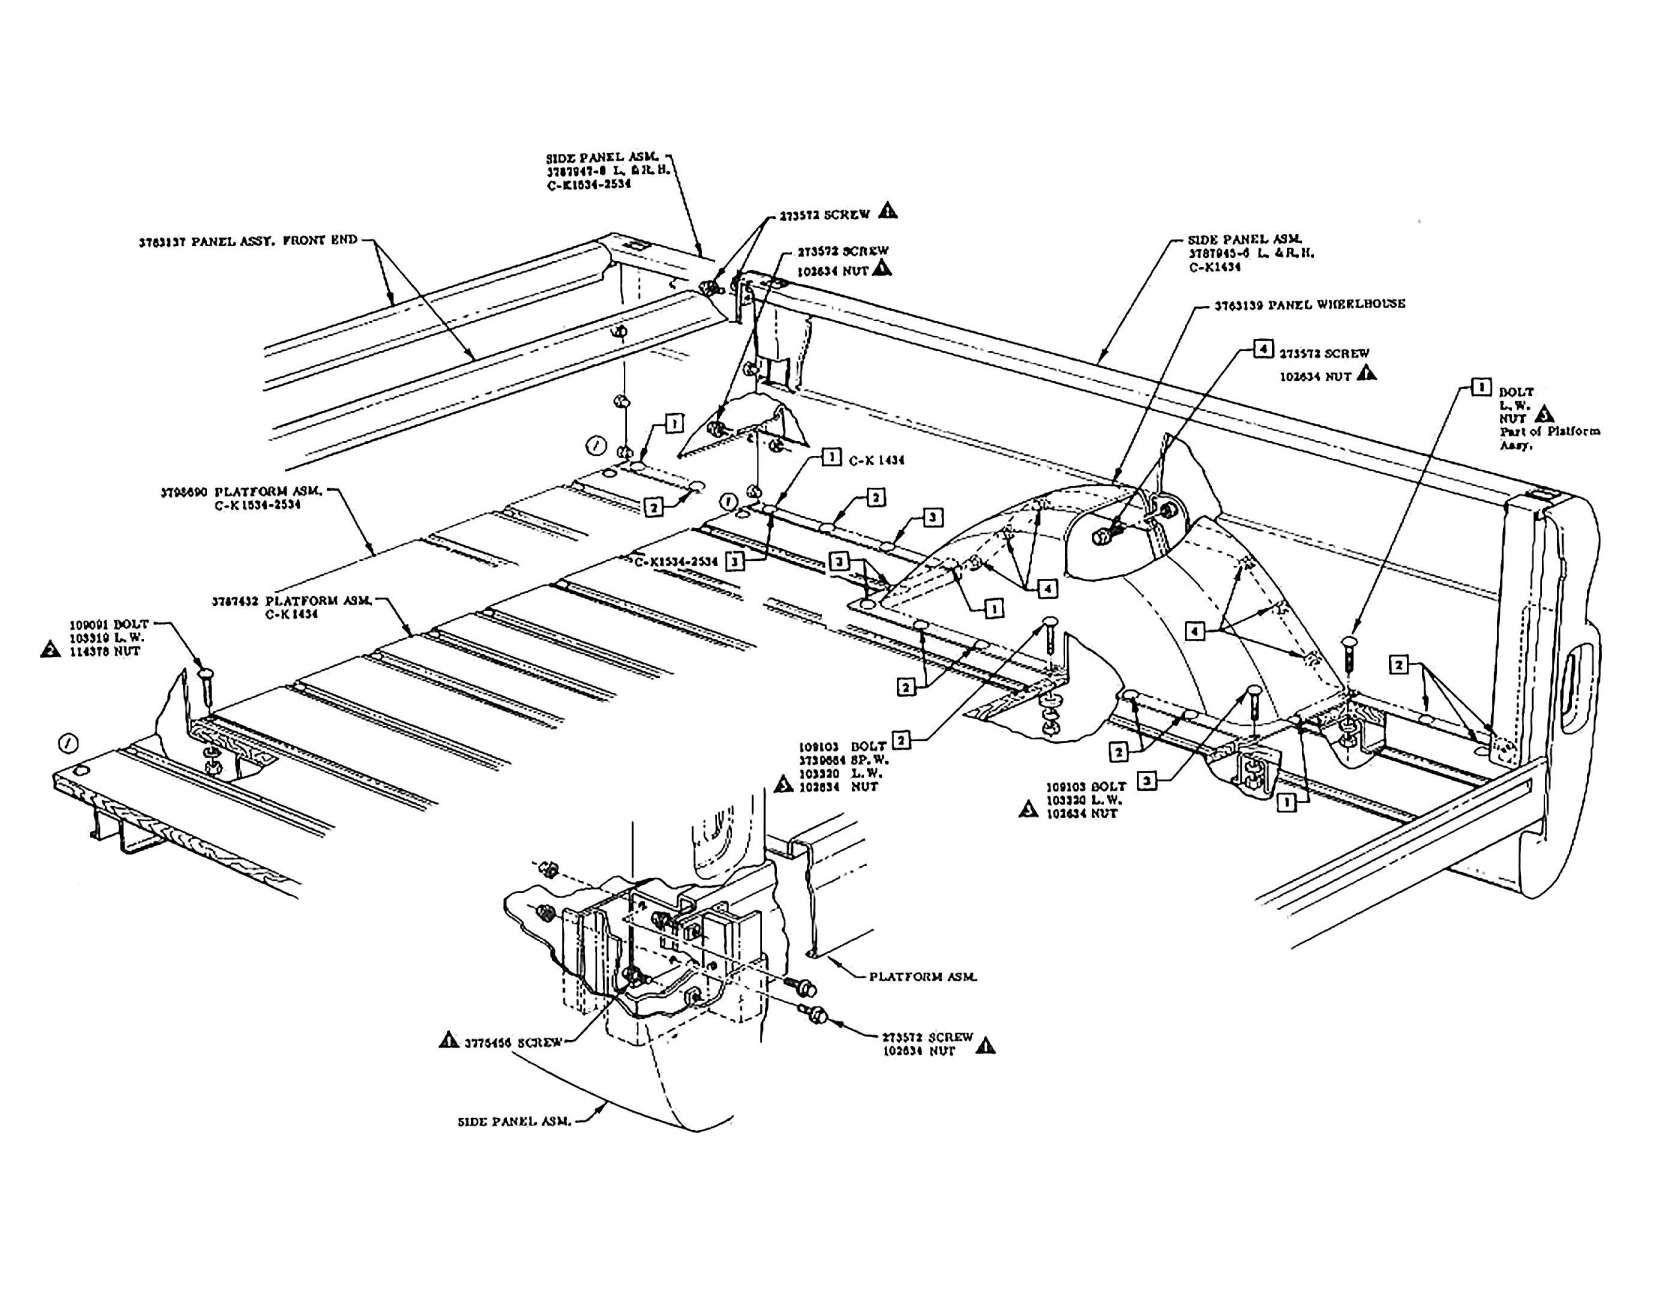 15 Chevy Truck Parts Diagram Truck Diagram In 2020 Chevy Trucks 1966 Chevy Truck Chevrolet Trucks